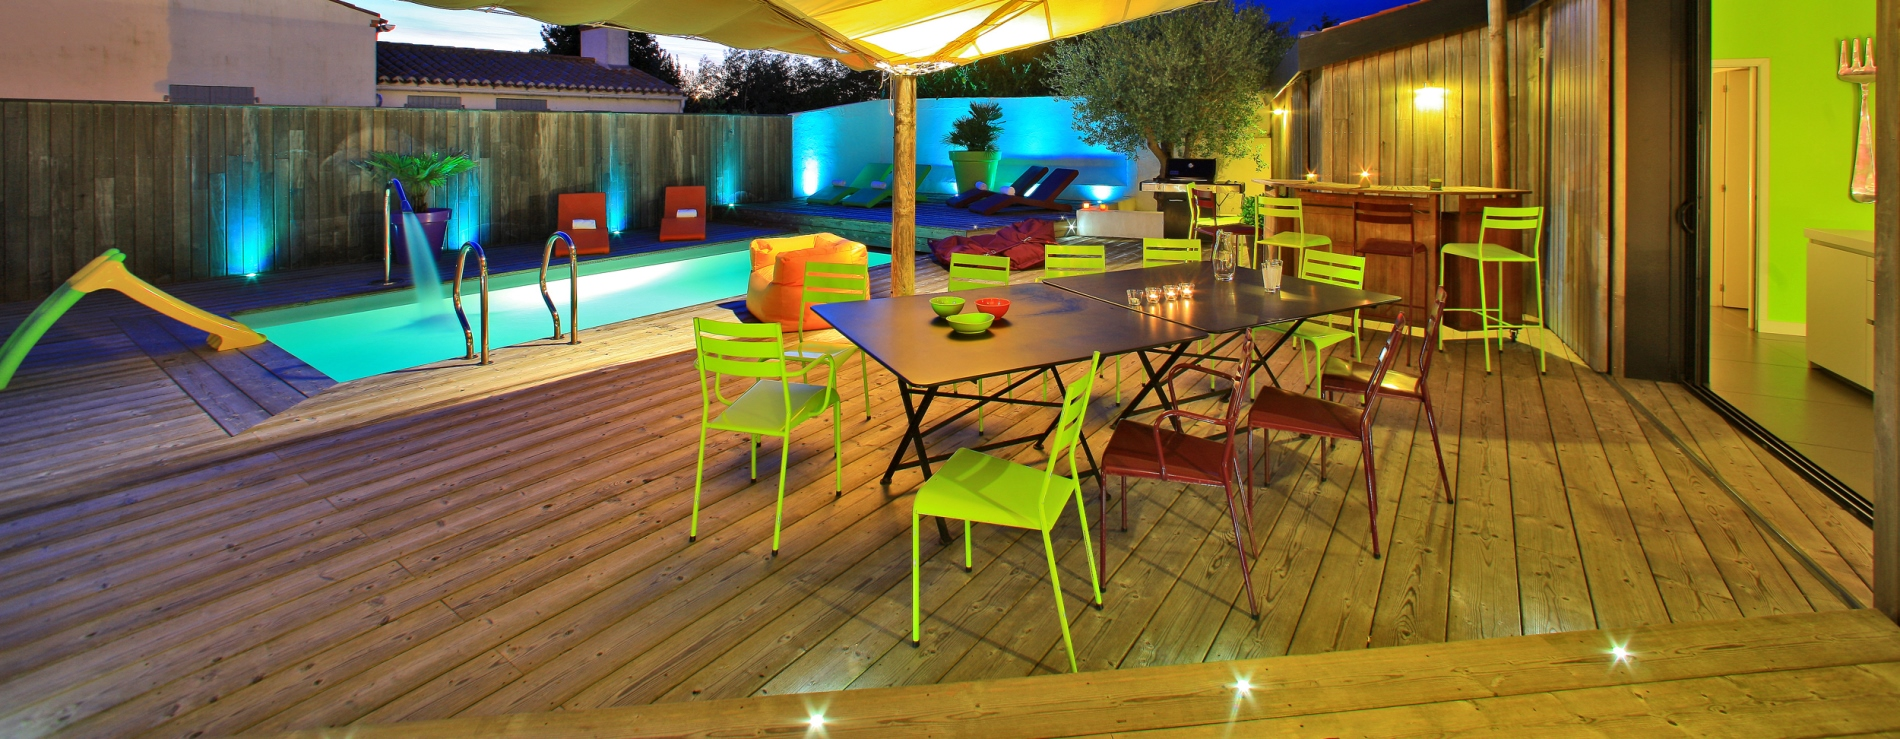 terrasse voile d'ombrage coin repas villa de standing